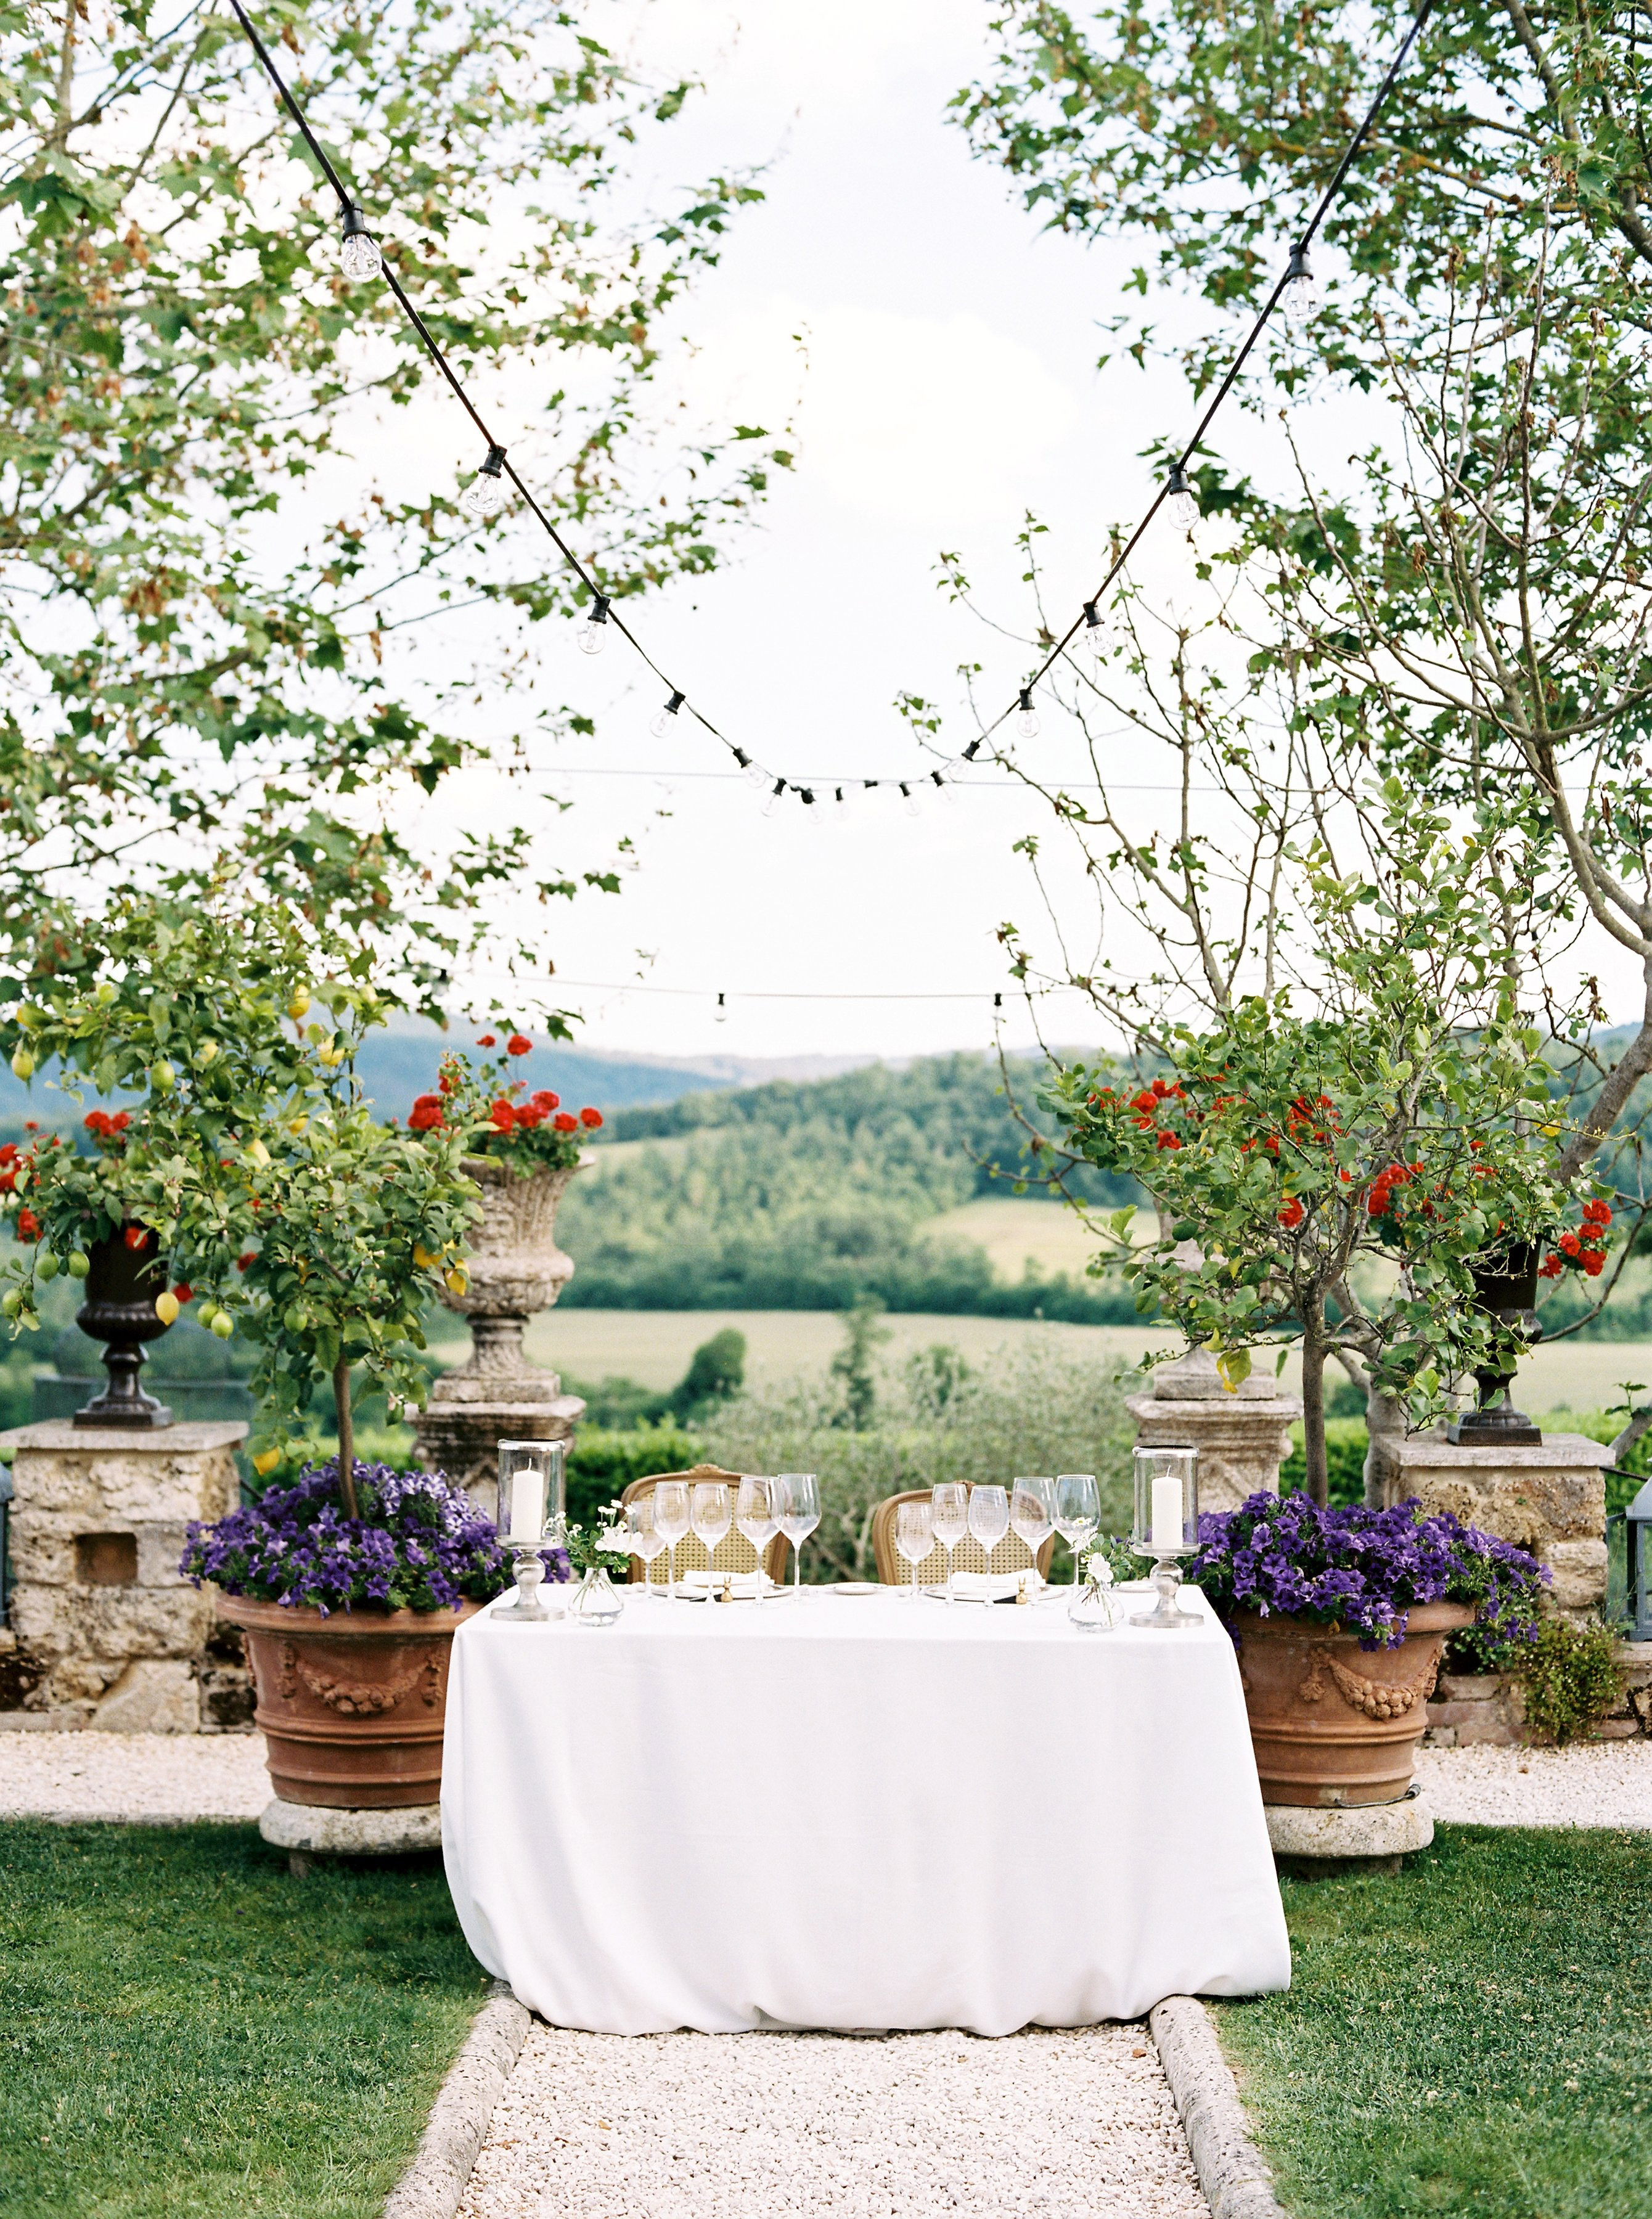 alexis zach wedding italy sweet heart table